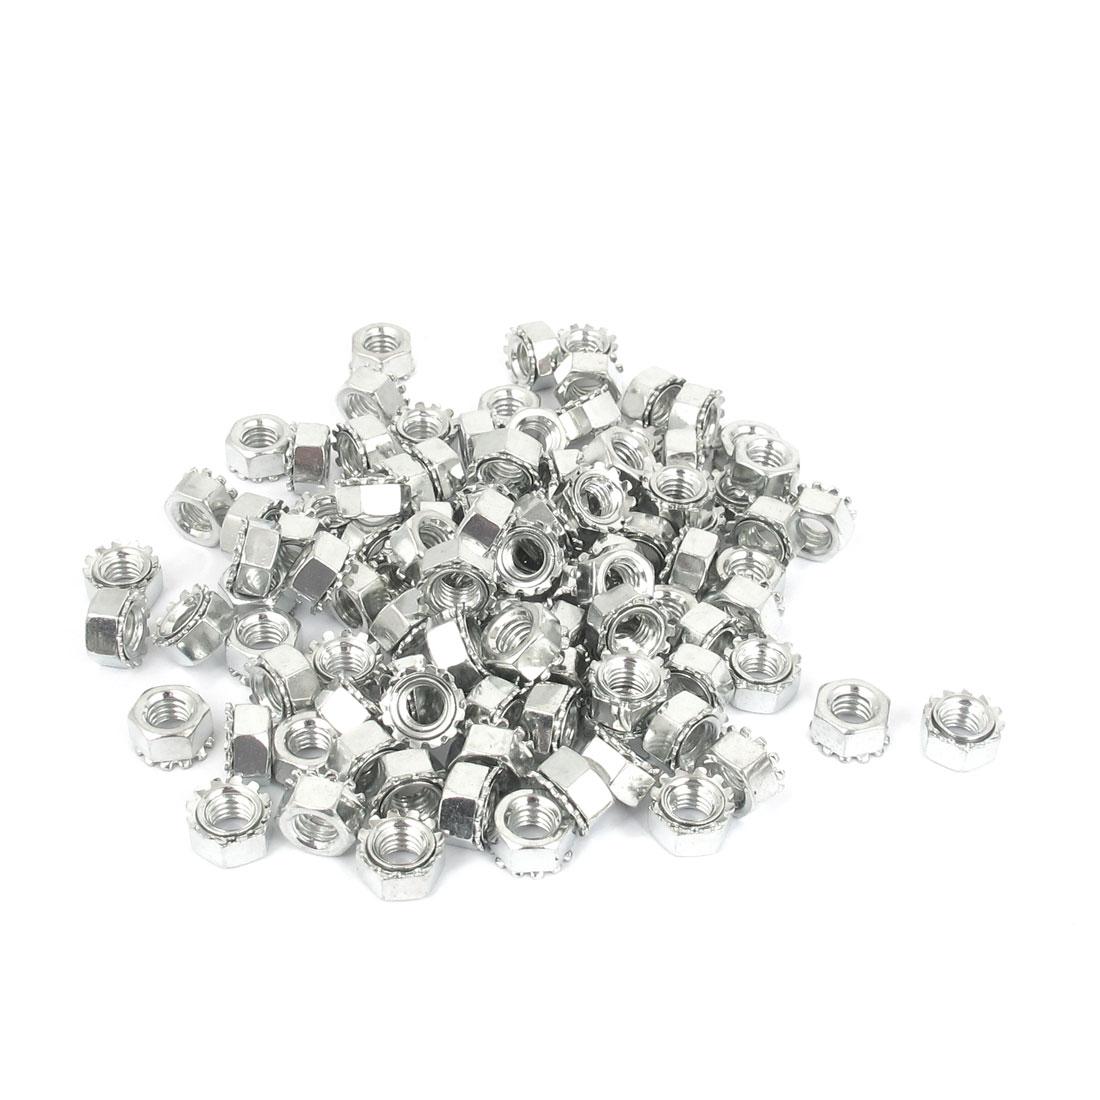 M6 Thread Dia Zinc Plated External Tooth Locknuts Kep Nut Silver Tone 100pcs